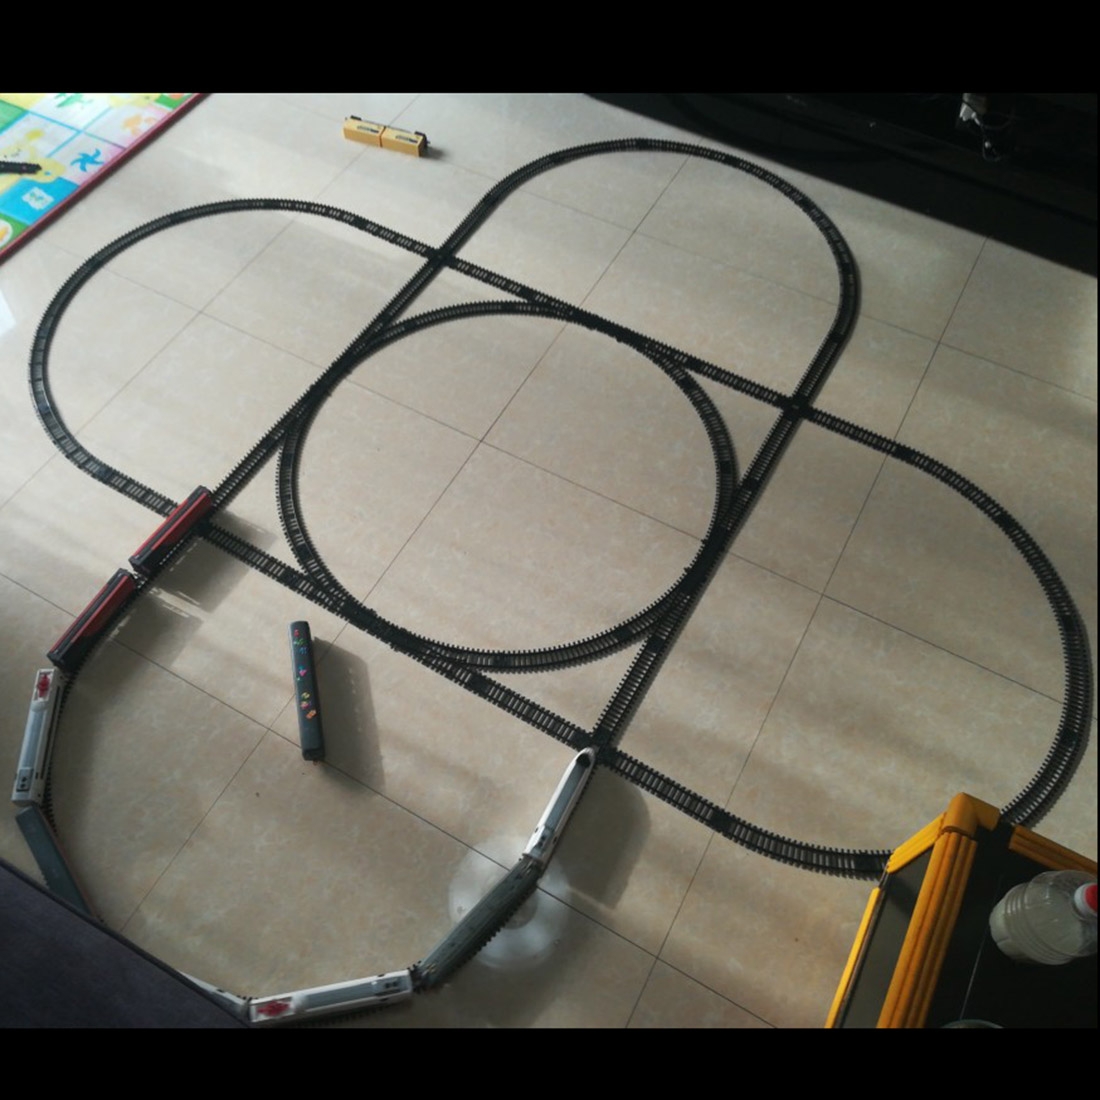 Surwish 14m 1:87 Sand Table Train Model Track Set Cross Track Set Ho Scale Model Train Accessories  -  Black